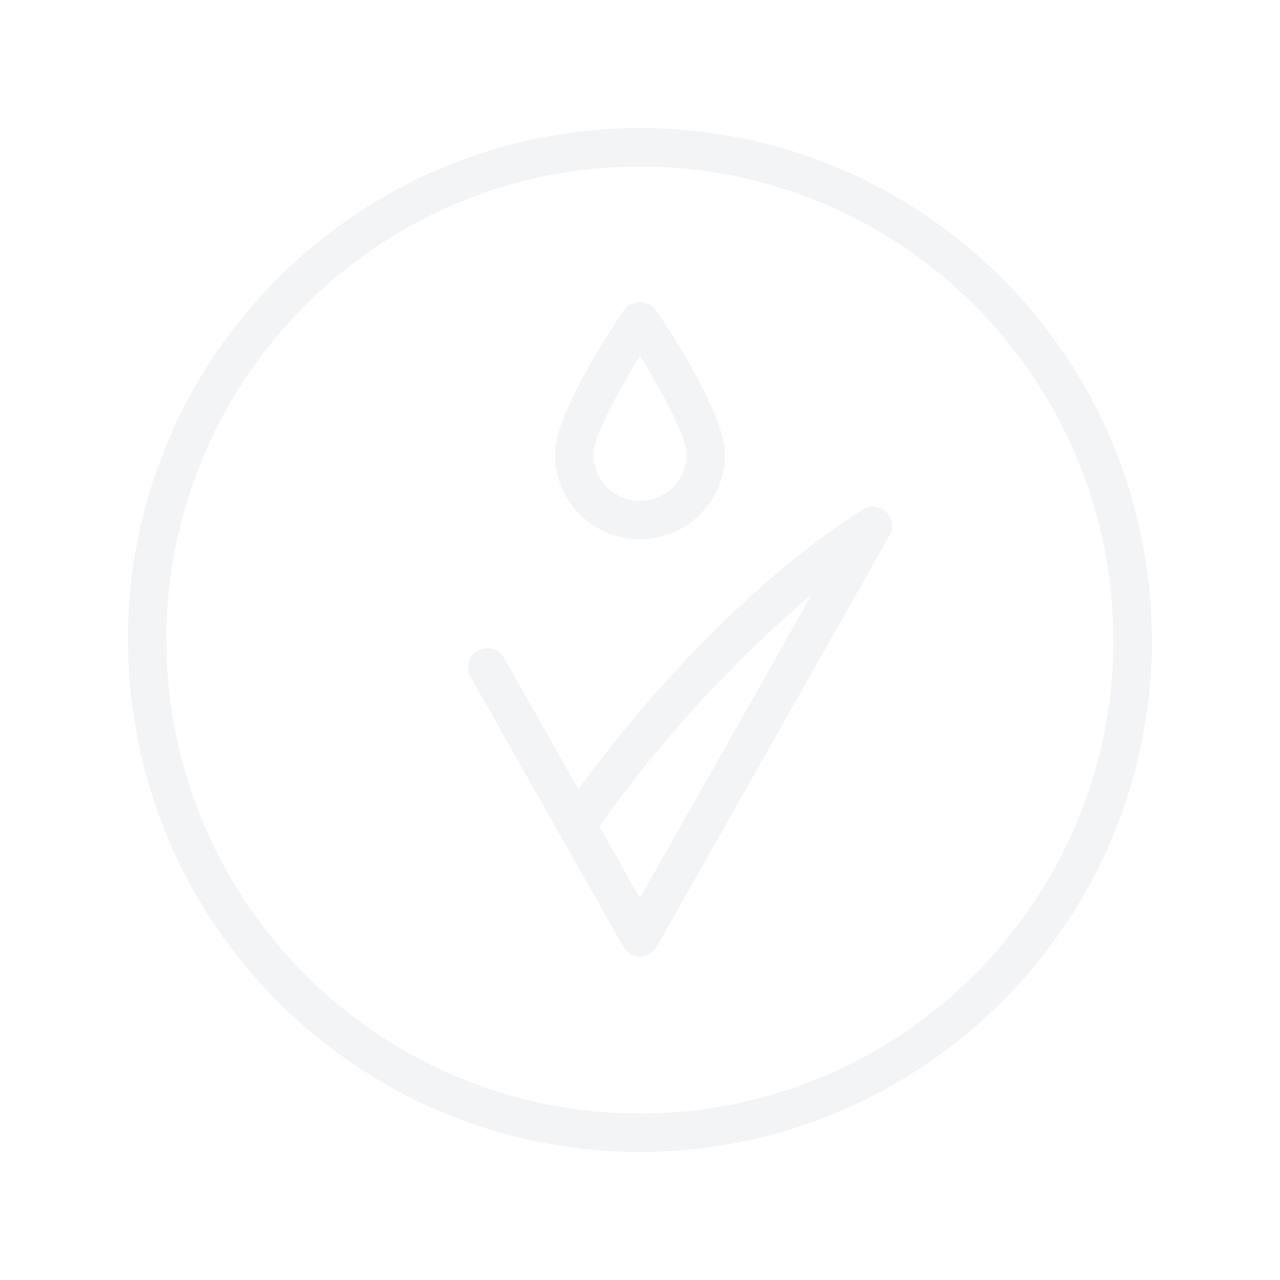 Collistar Pure Actives Hyaluronic Acid Moisturizing Lifting 30ml